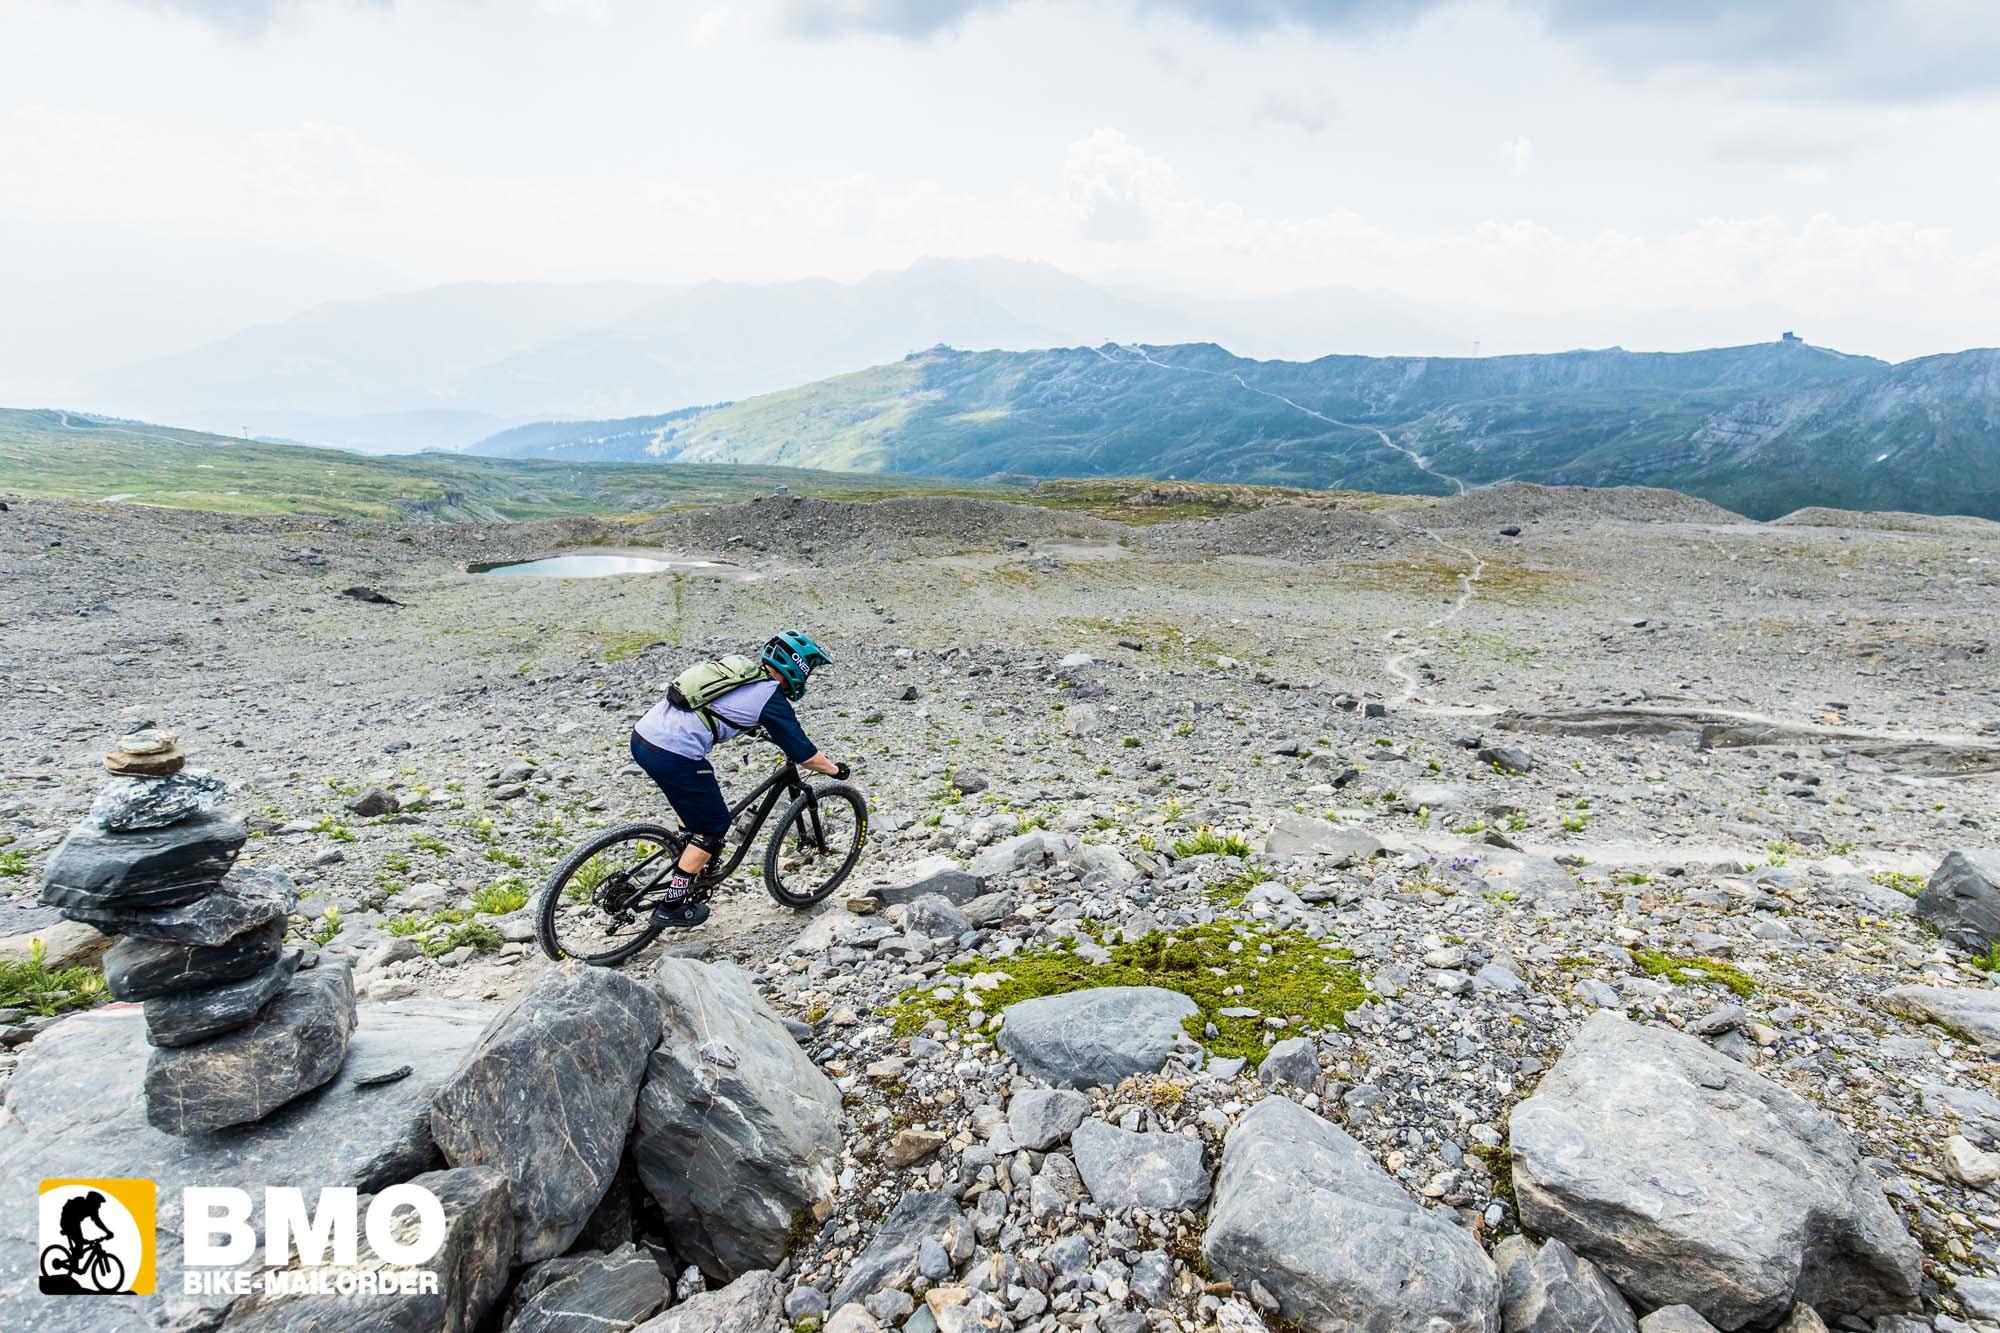 bike-mailorder-blog-acros-aflat-pedal